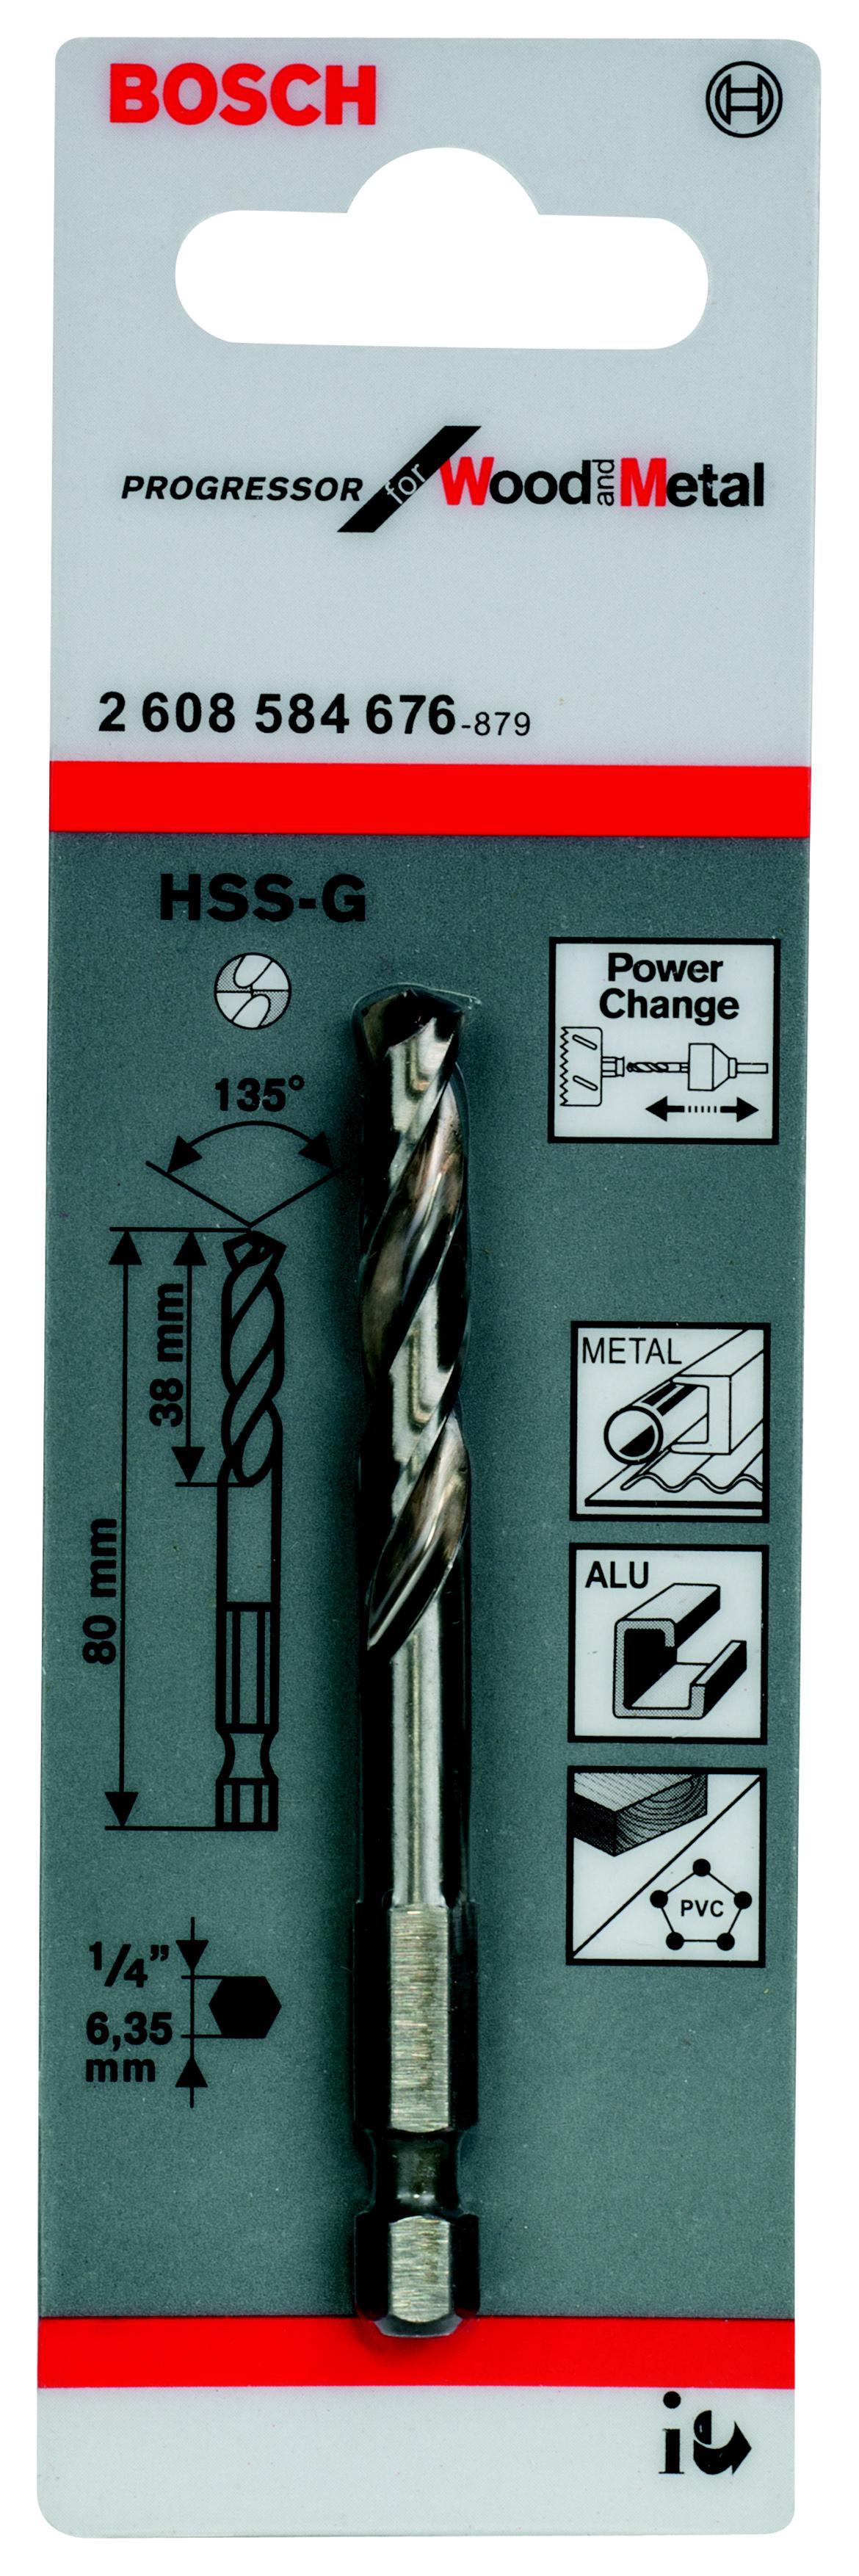 Сверло центрирующее Bosch 2608584676 сверло универсальное 5х85 мм bosch профи